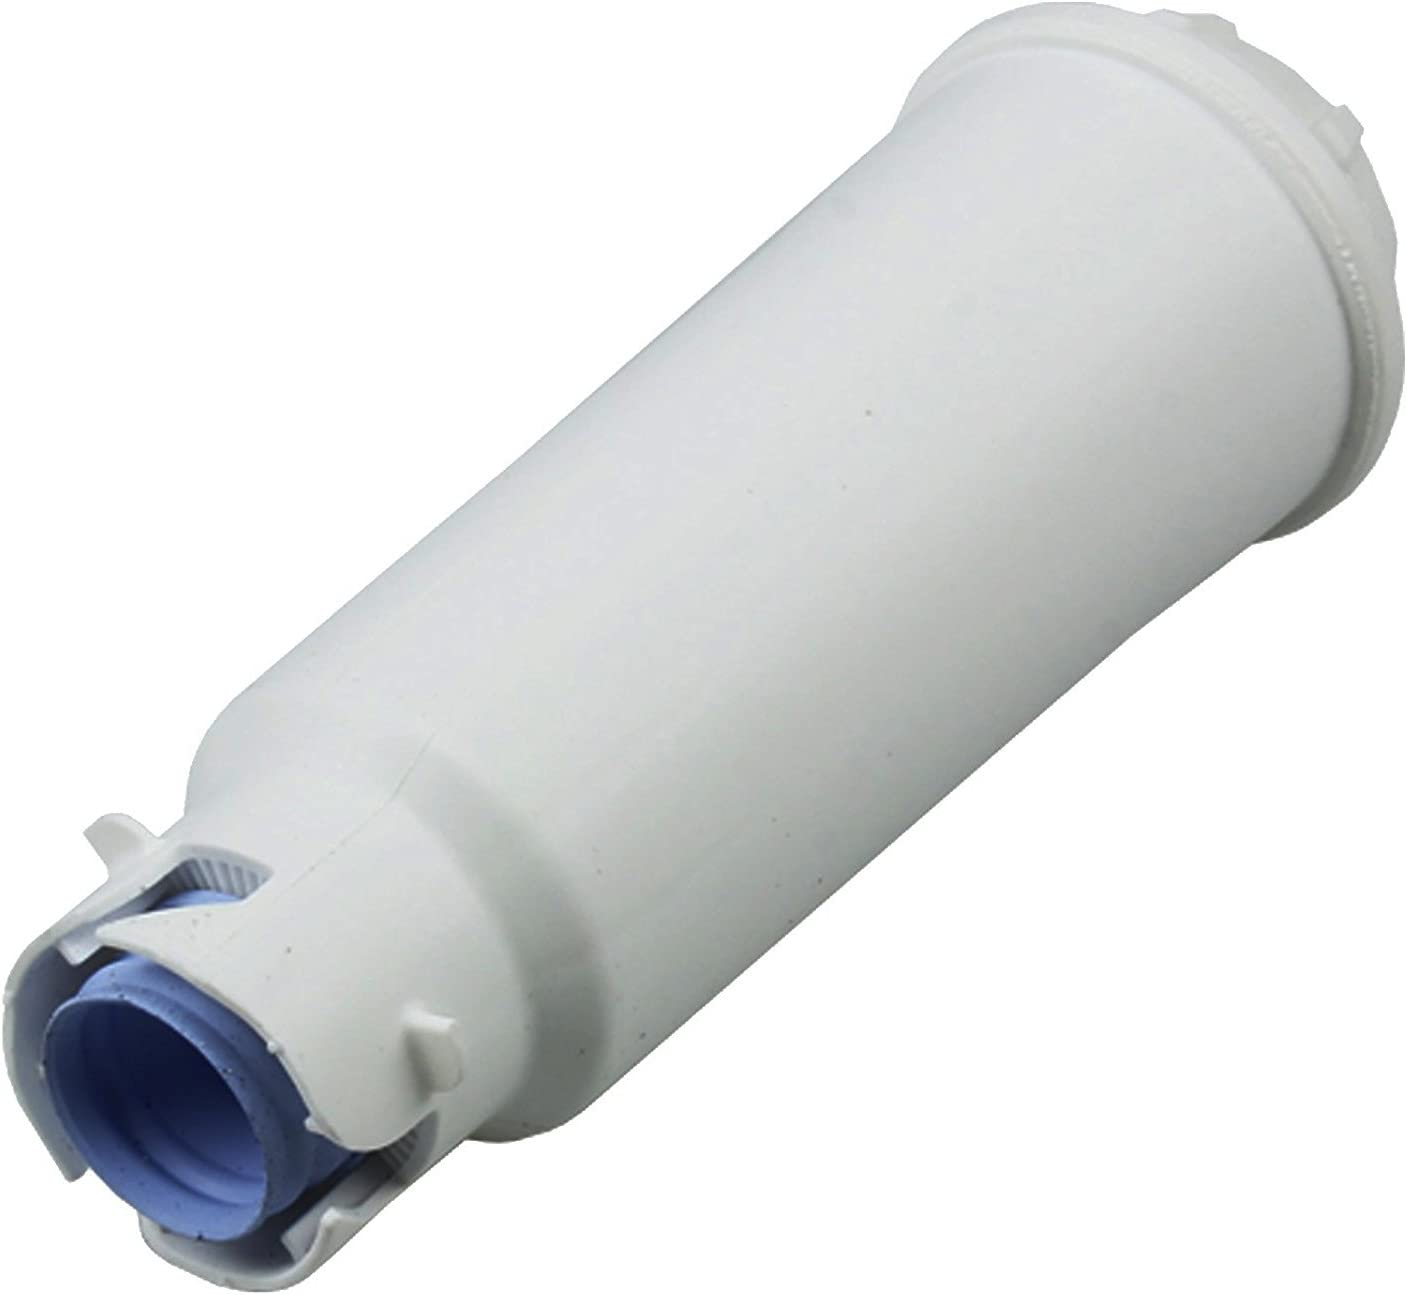 Spares2go Cartucho de filtro para Tefal Claris Quick Cup//Hot Deluxe dispensador de agua